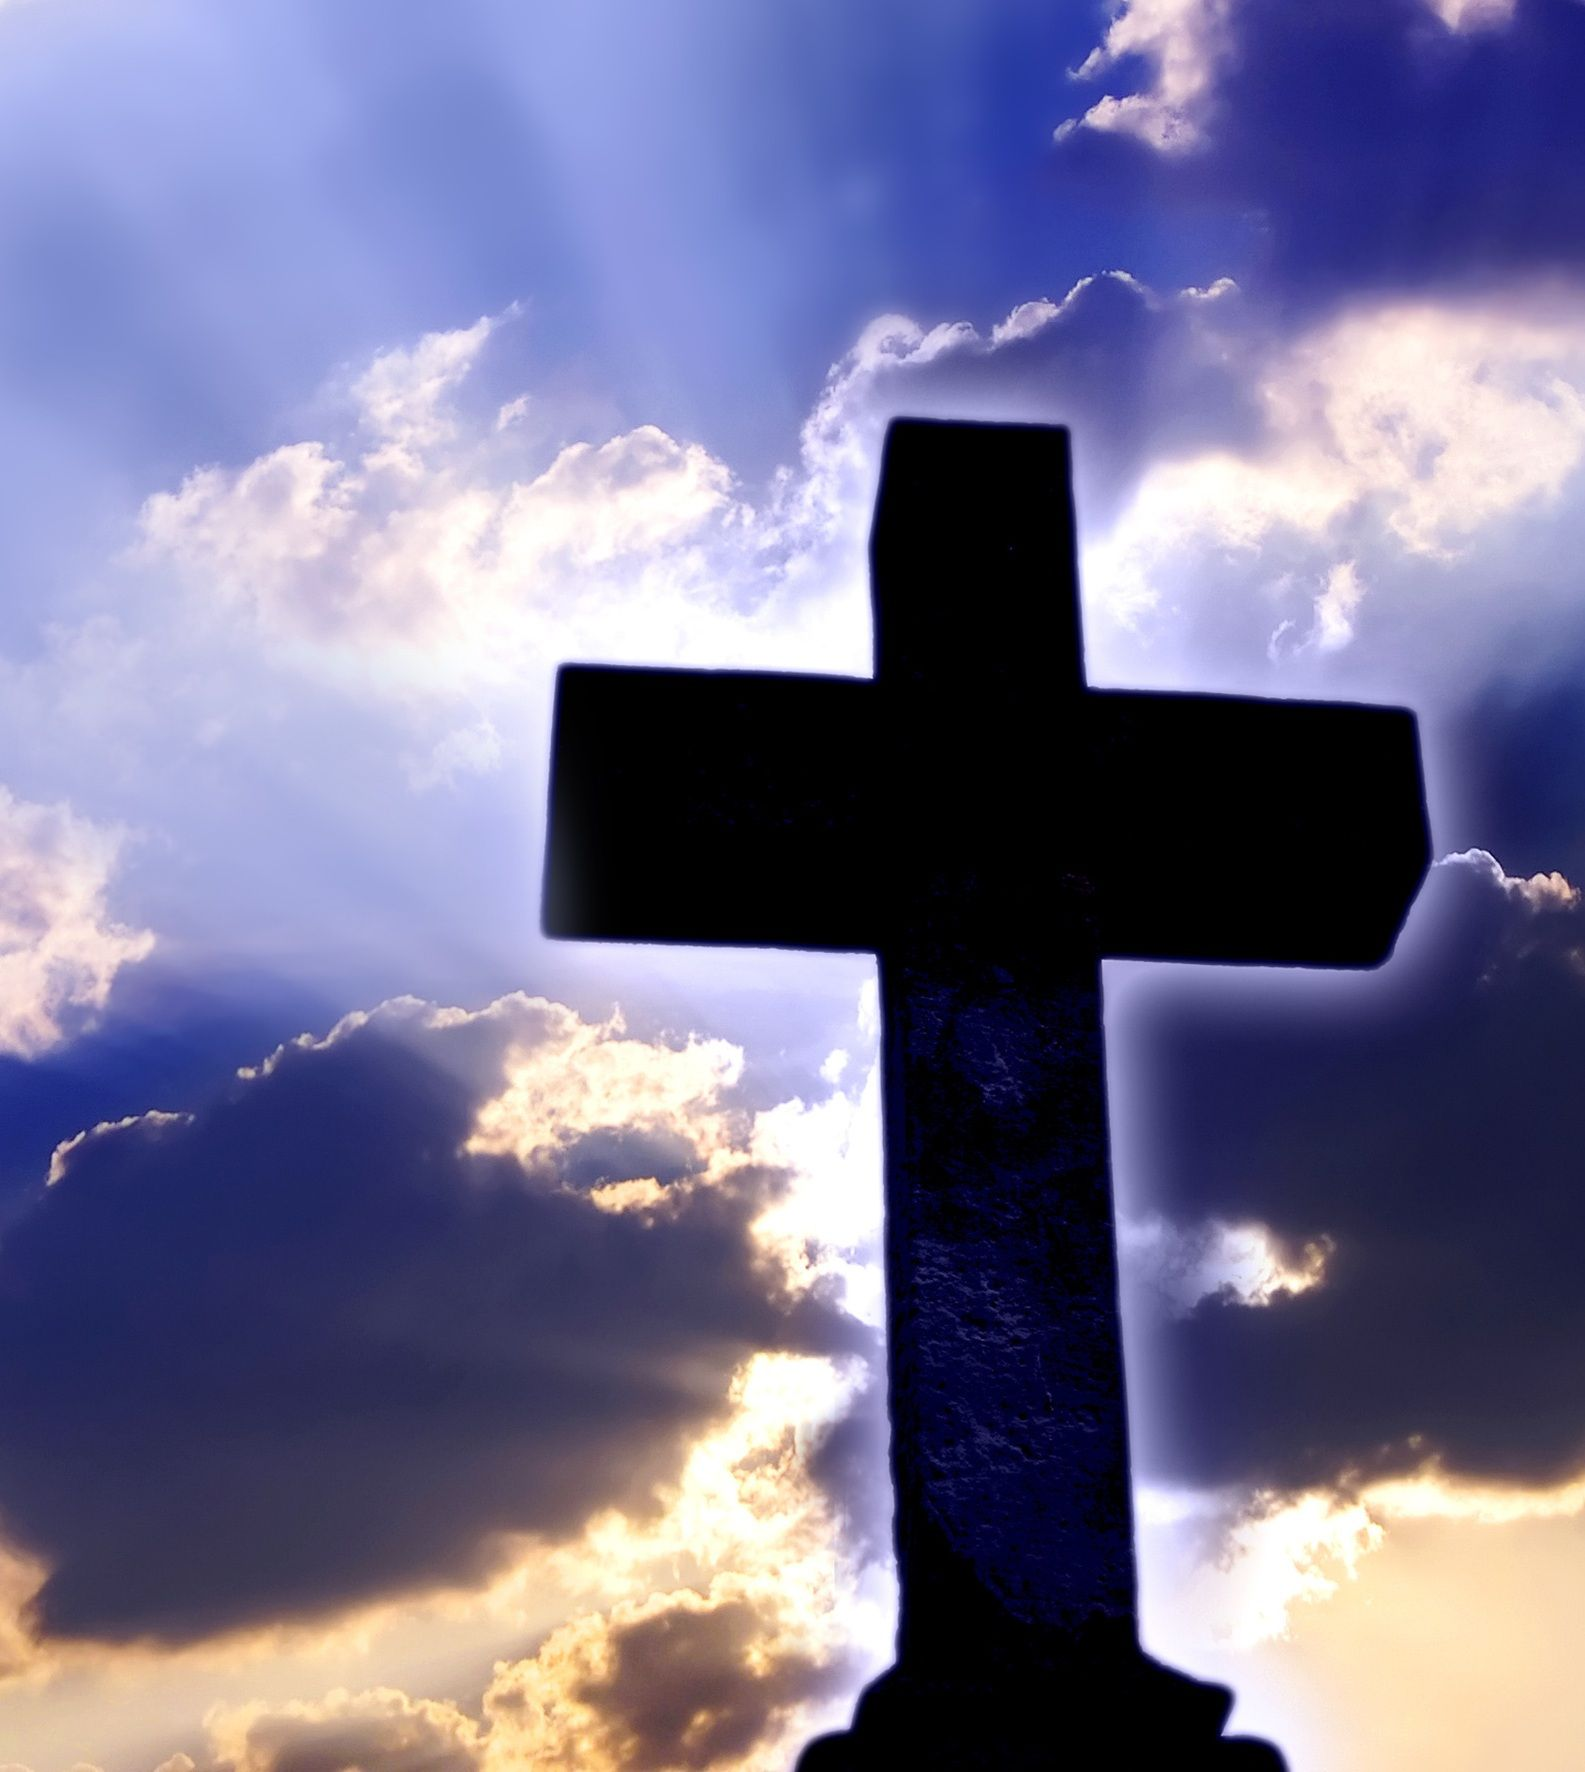 Christian Desktop Wallpaper: What Would My Jesus Do